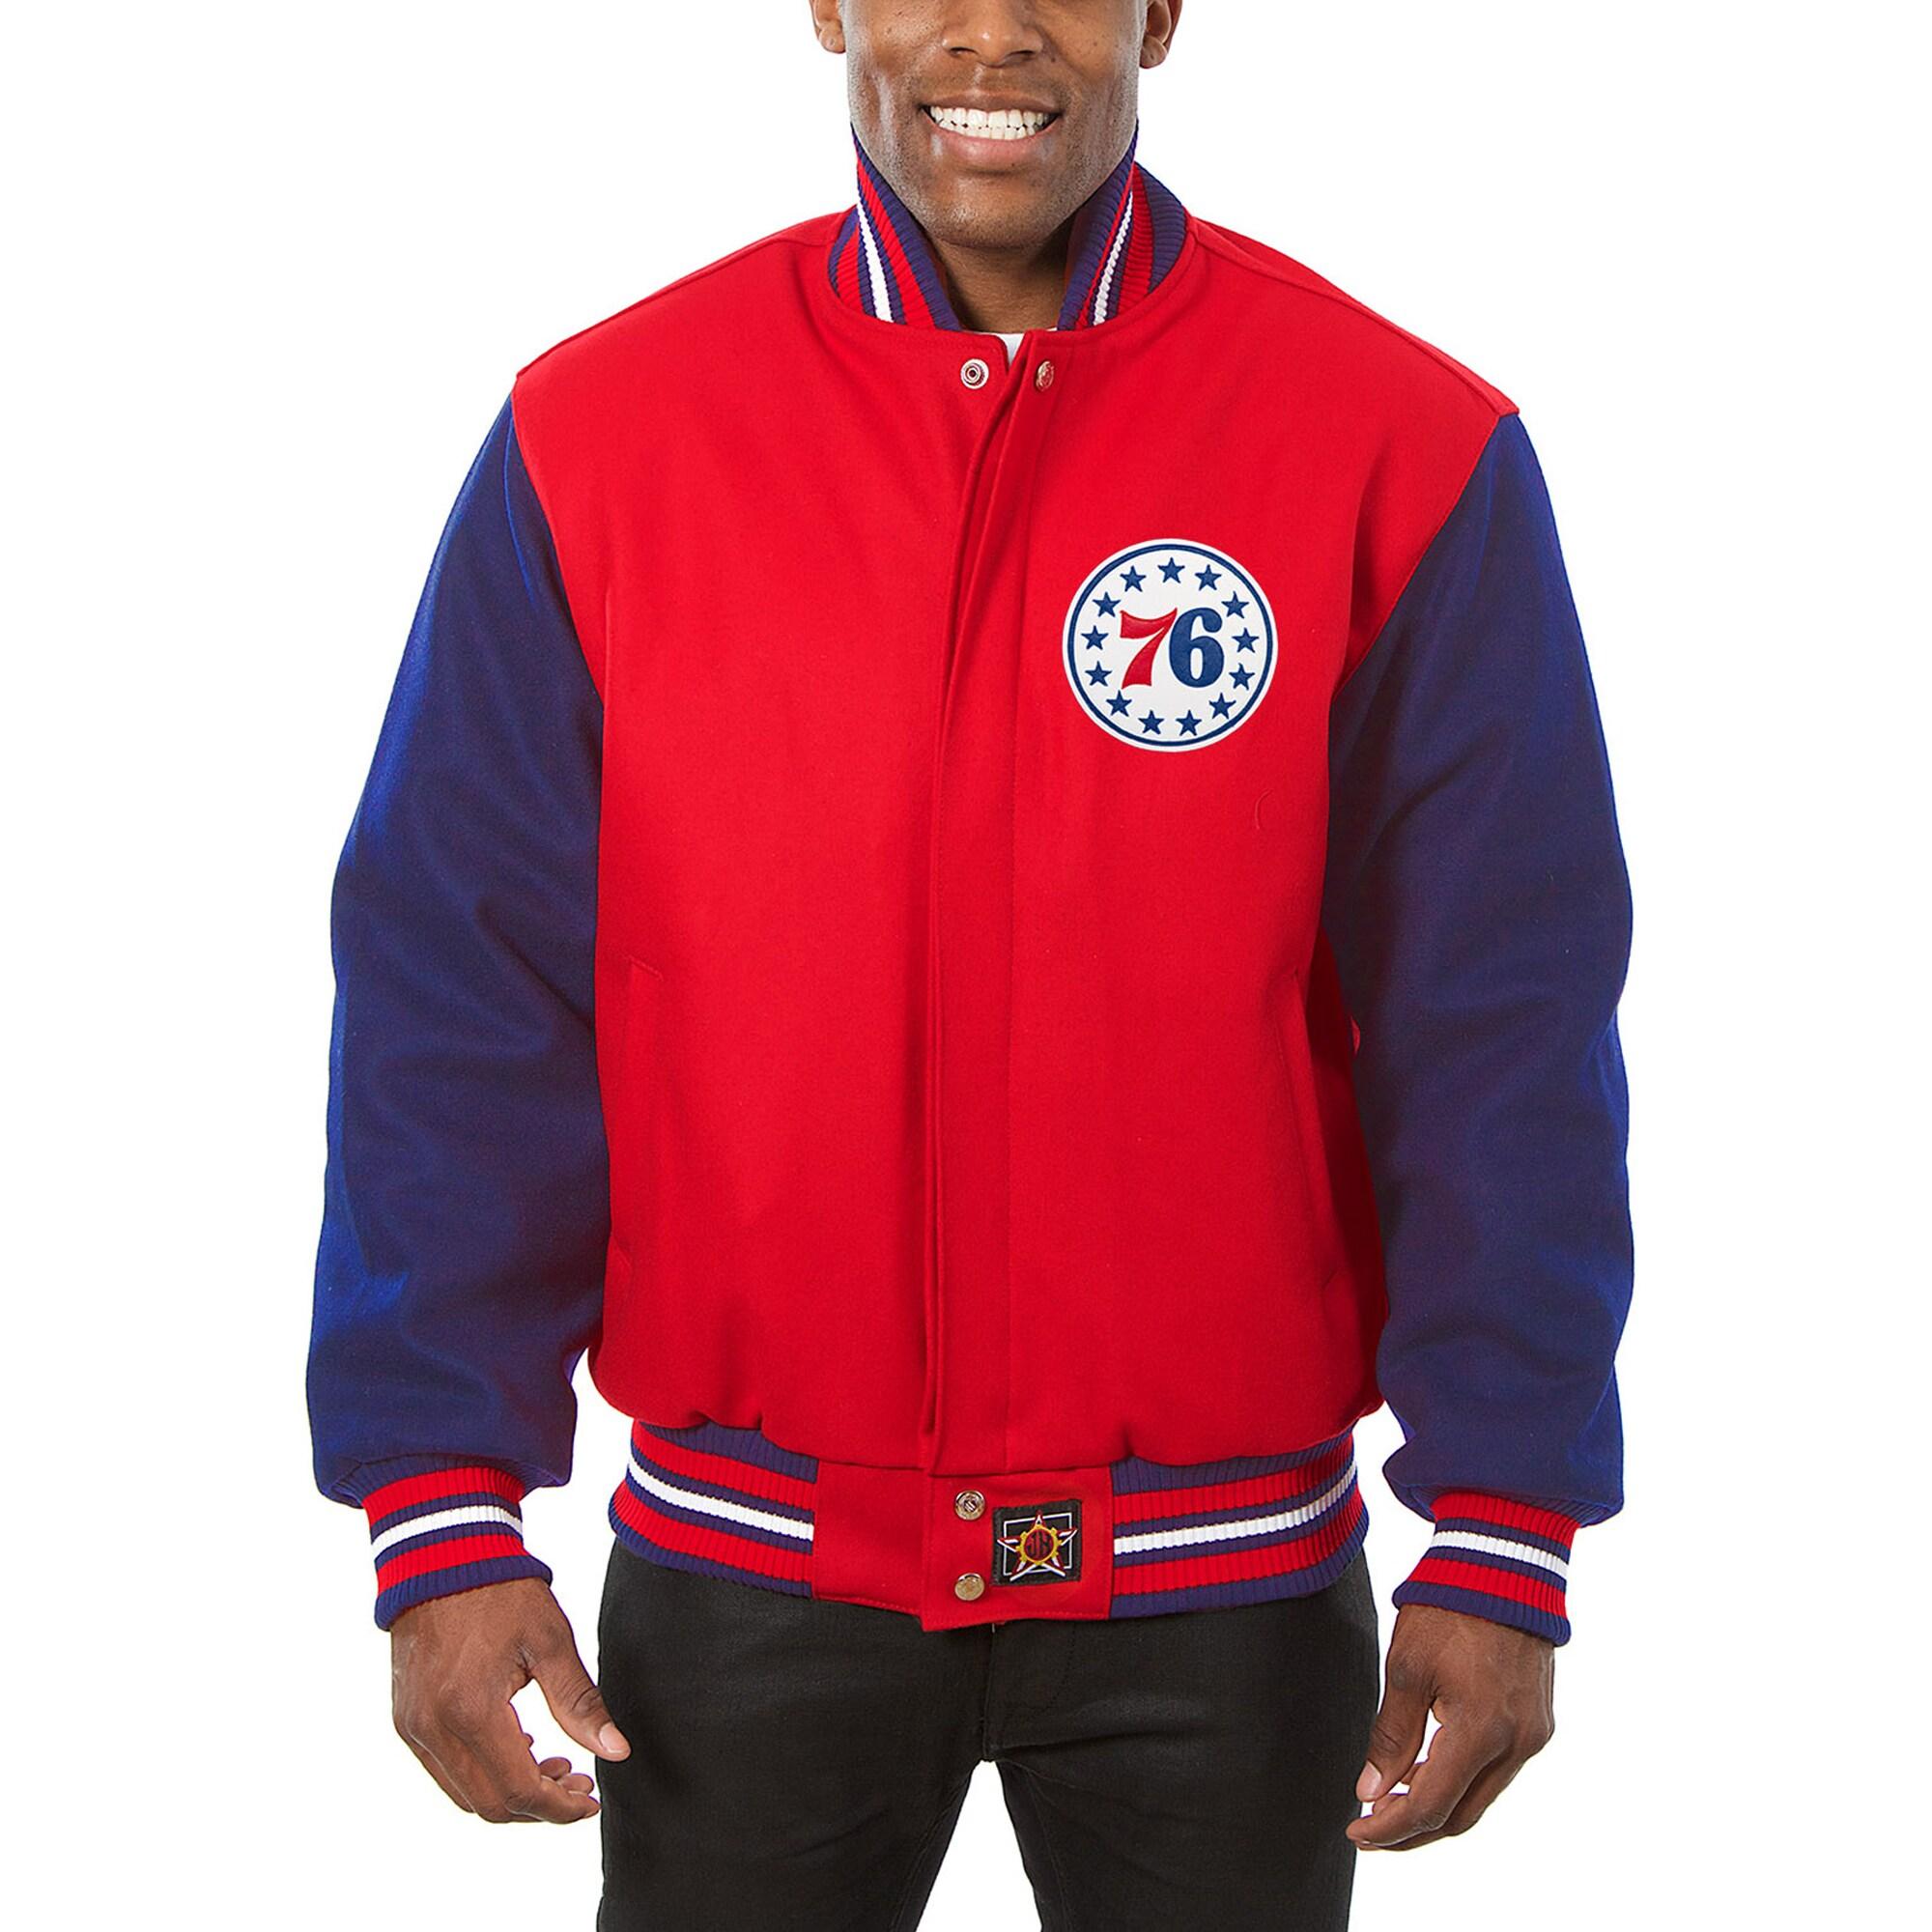 Philadelphia 76ers JH Design Domestic Two-Tone Wool Jacket - Red